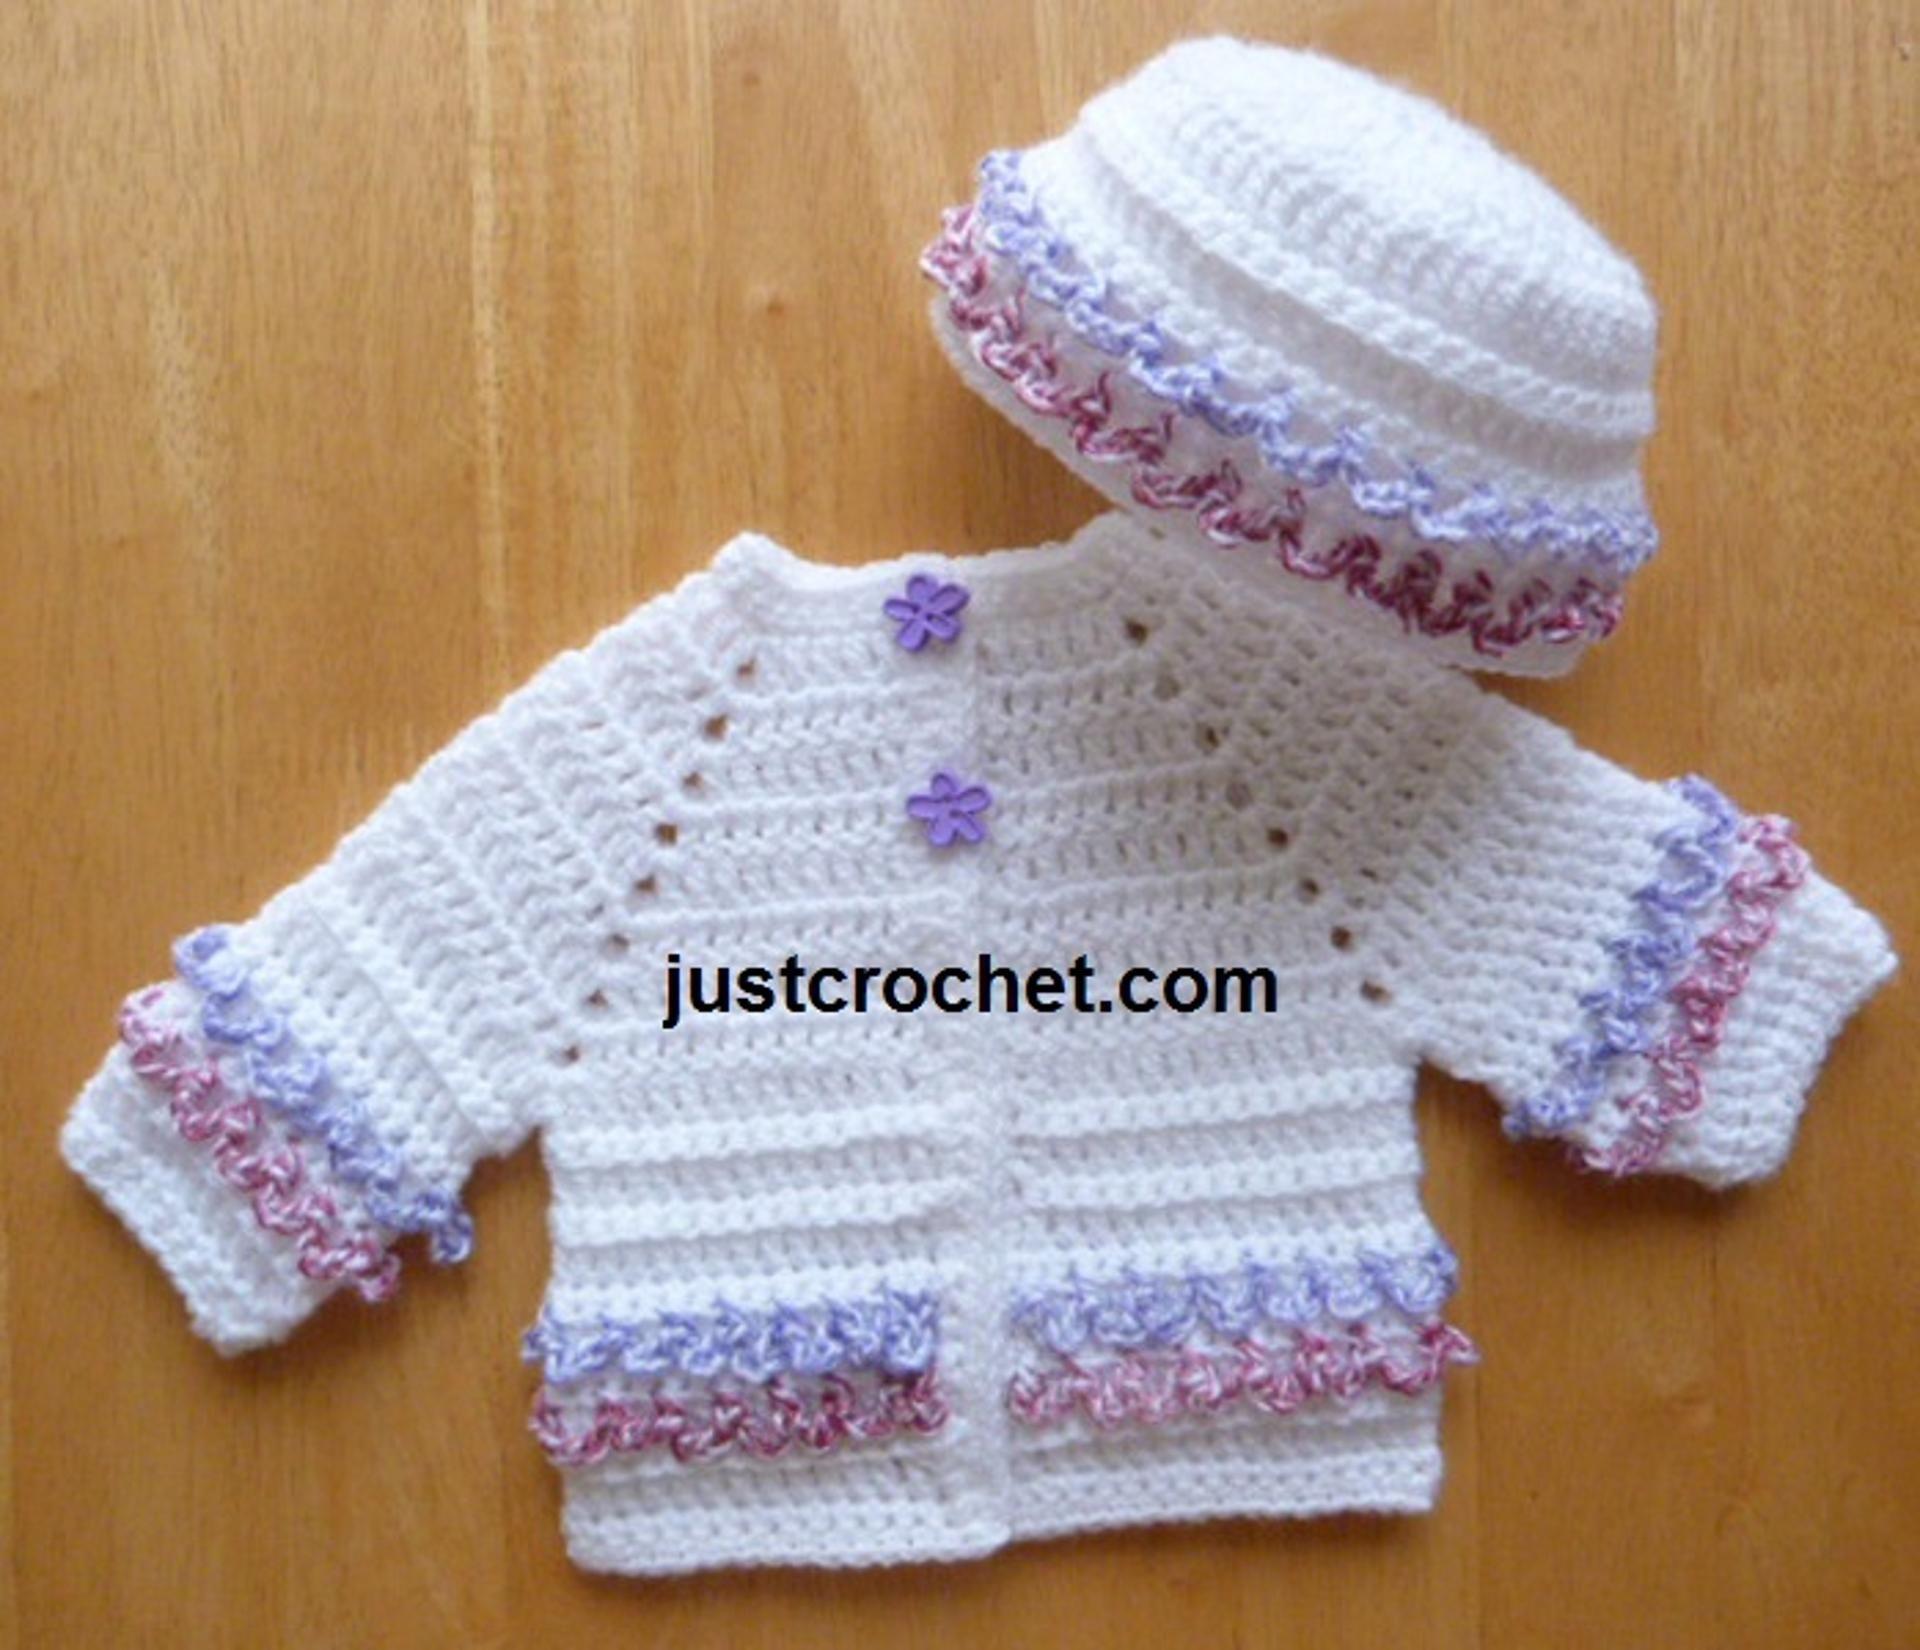 fjc109-Coat and Hat Baby Crochet Pattern | Craftsy | Crochet: Baby ...